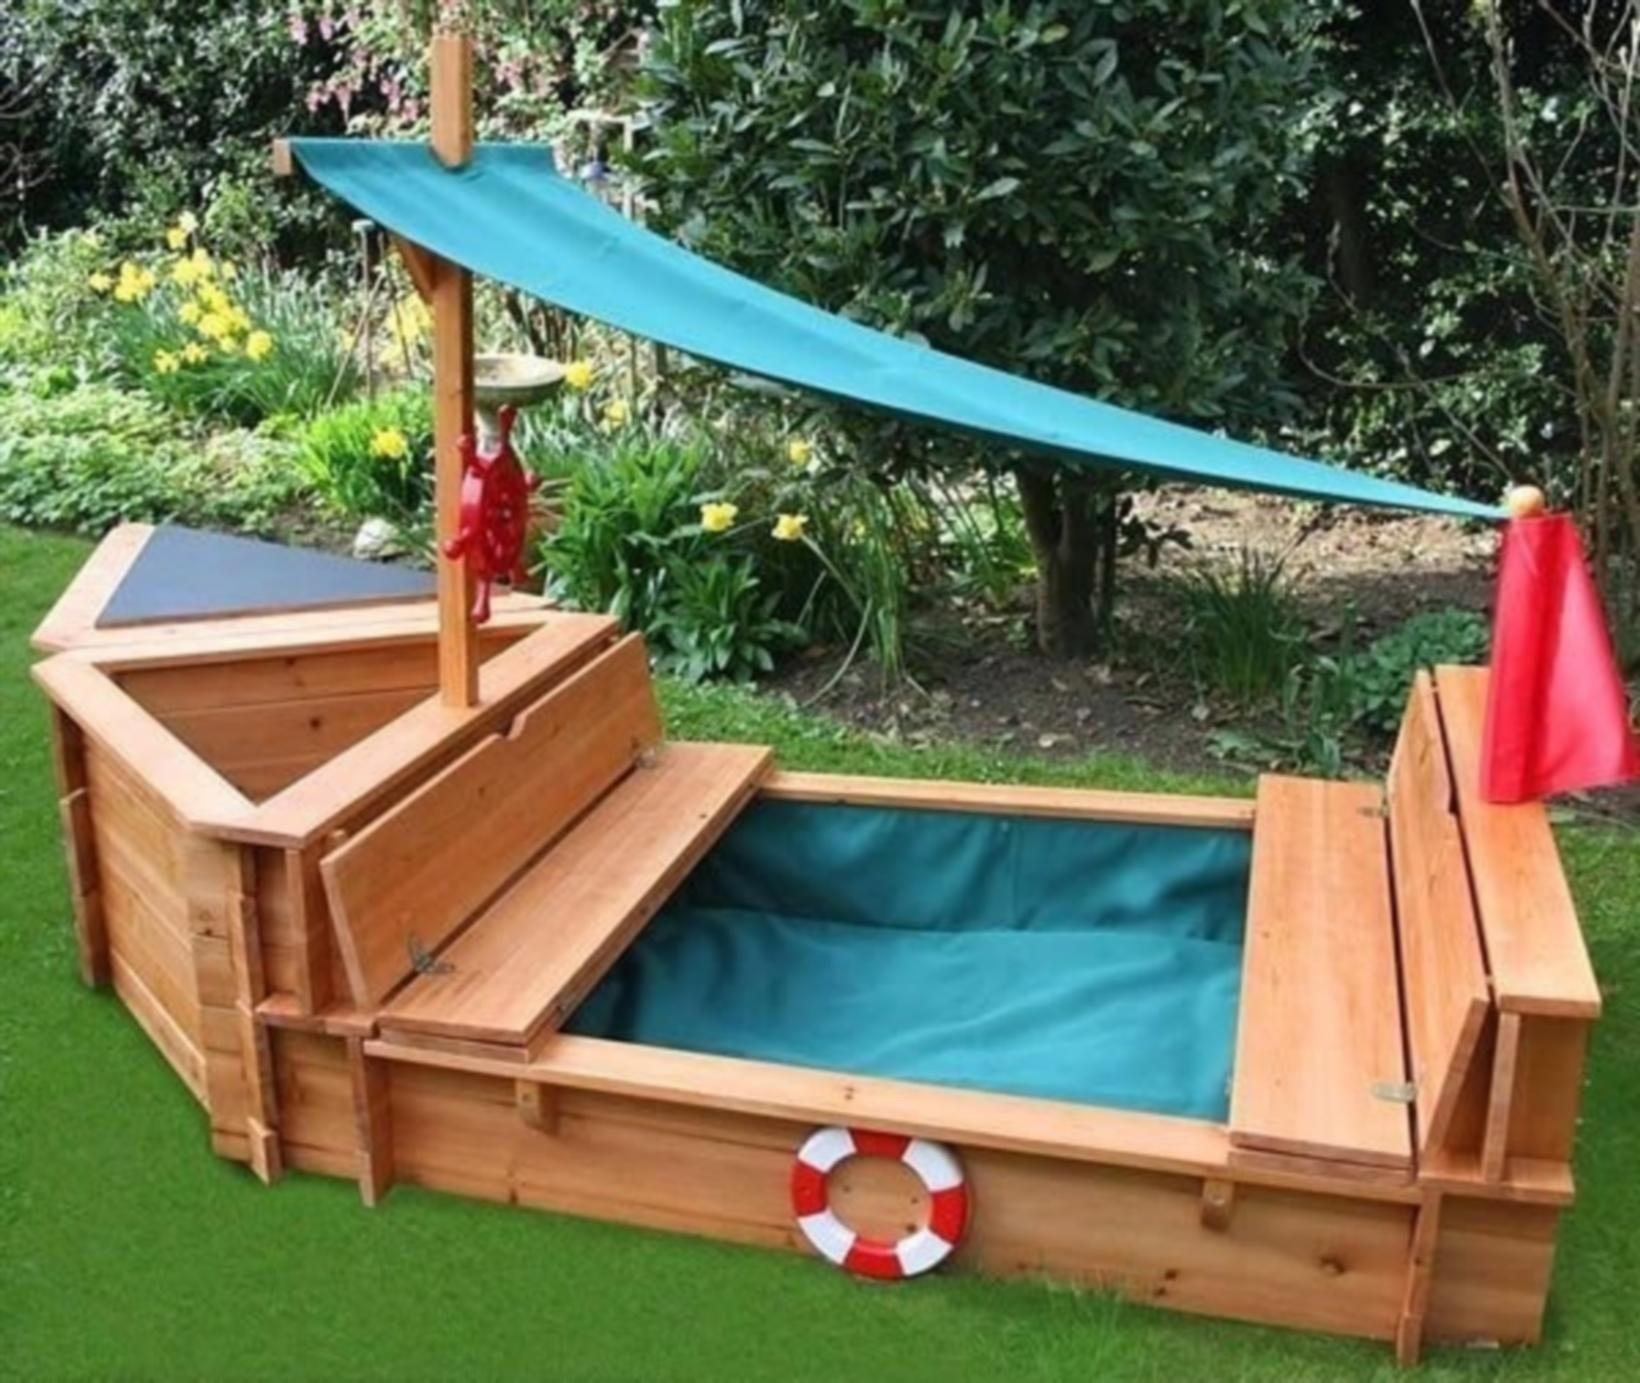 Incroyable Wood Sandbox With Cover 1